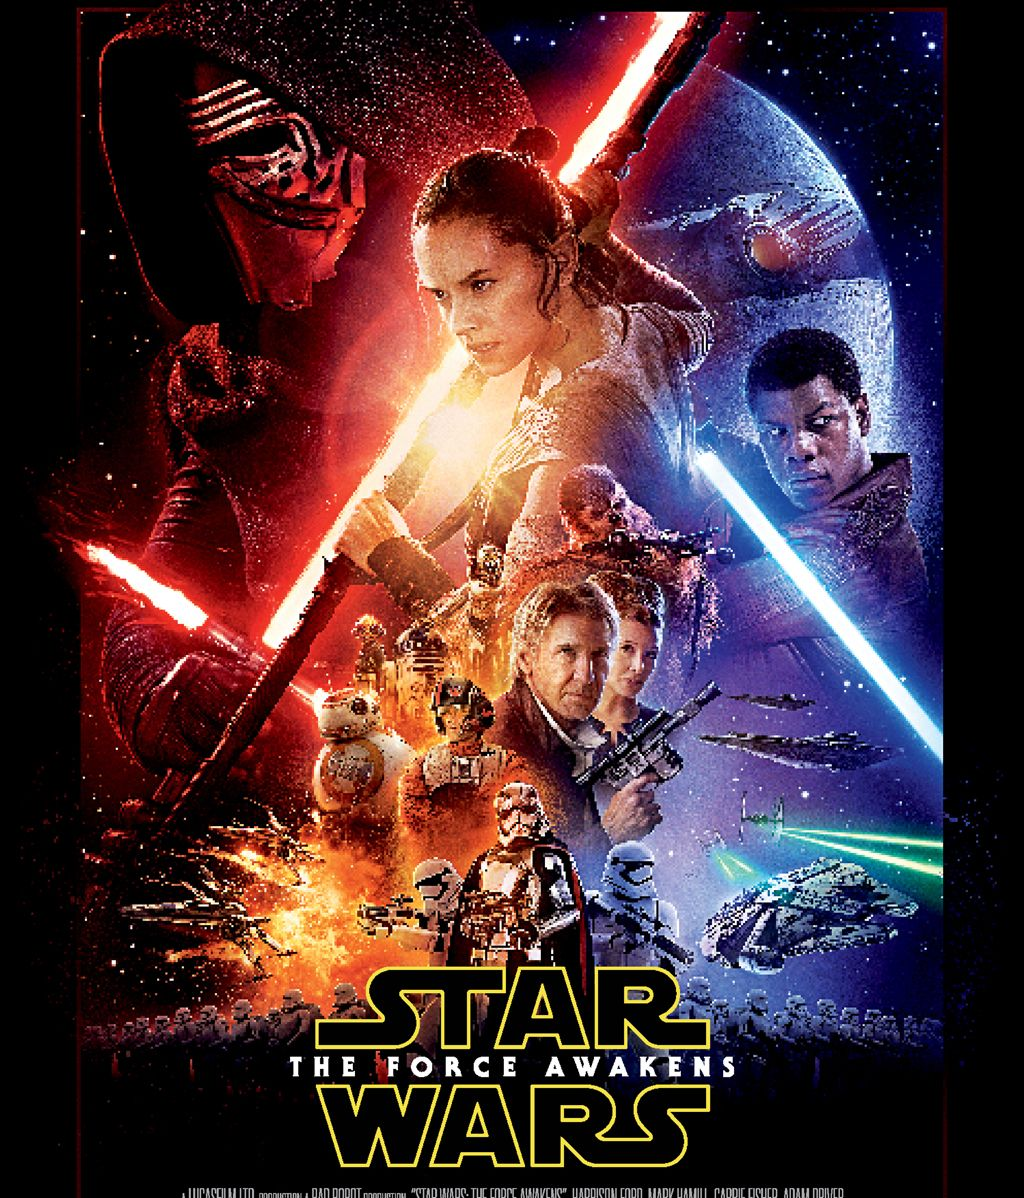 Póster de 'El despertar de la fuerza' de 'Star Wars'